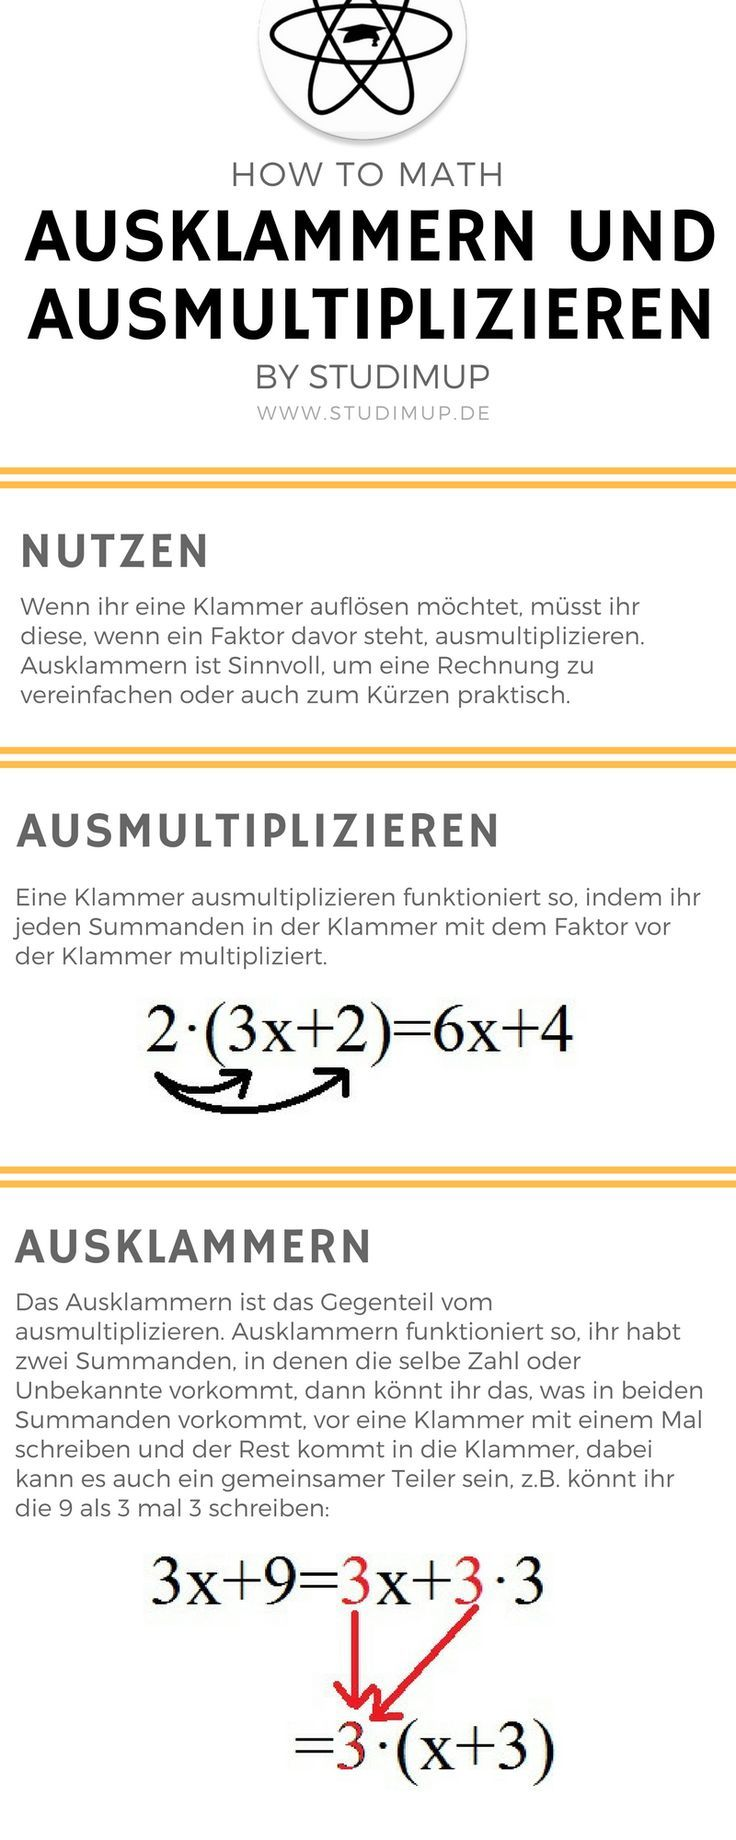 104 best Mathe images on Pinterest   Algebra, School and Education